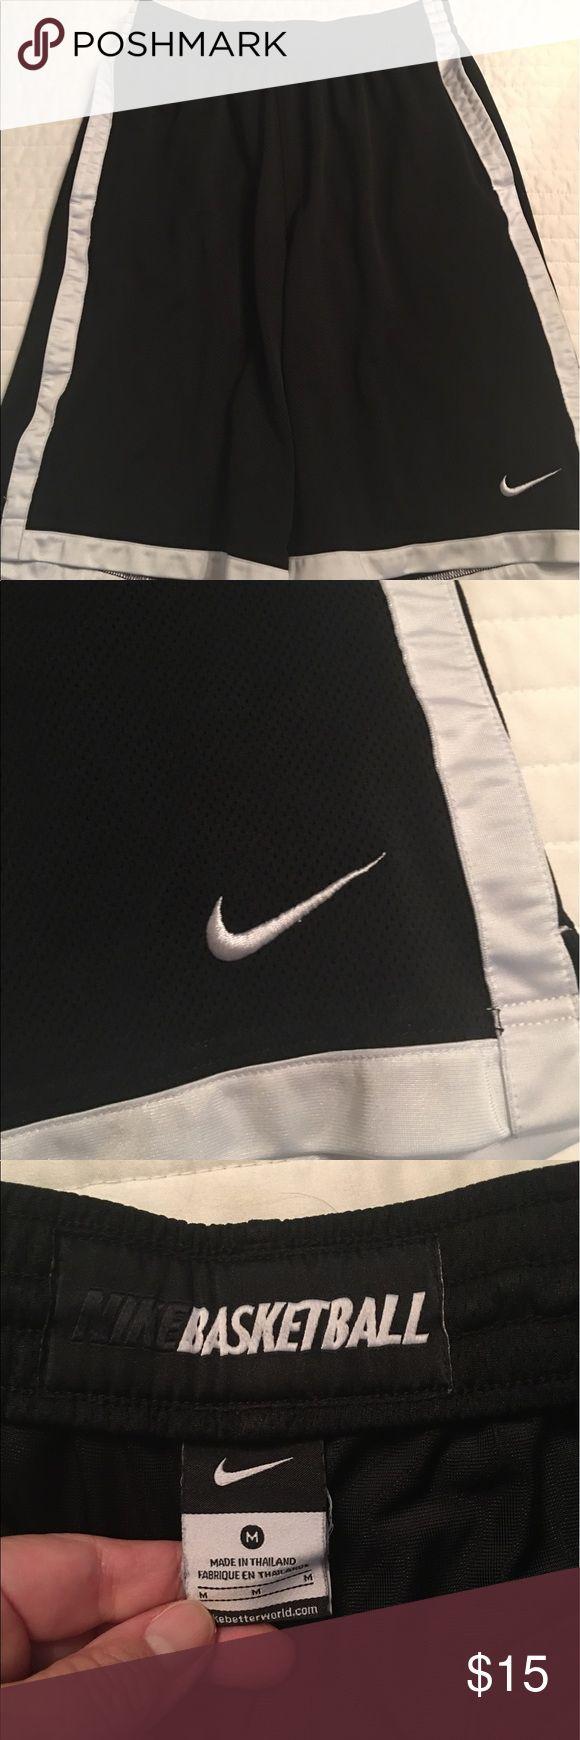 Men's Nike basketball shorts Black Nike basketball shorts with white piping. EUC. Nike Shorts Athletic